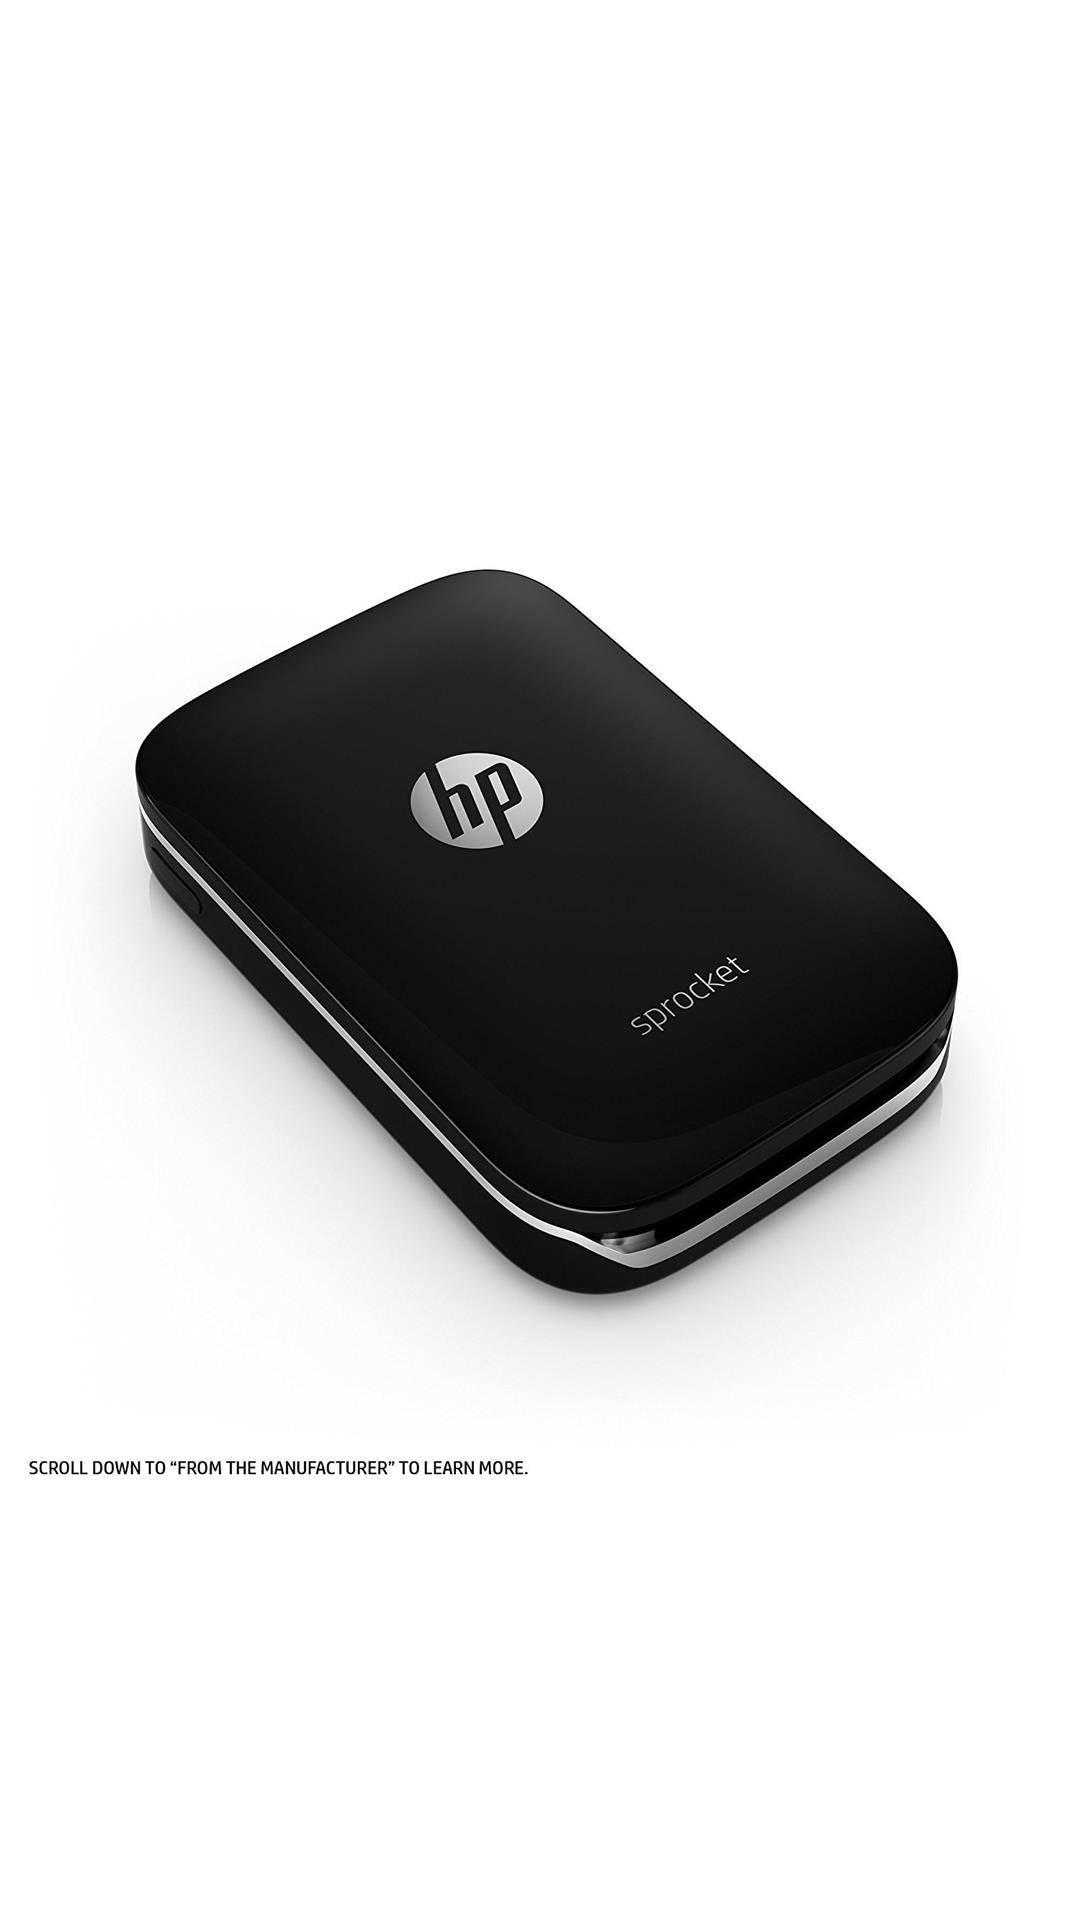 HP Sprocket (Z3Z92A) Portable Photo Printer